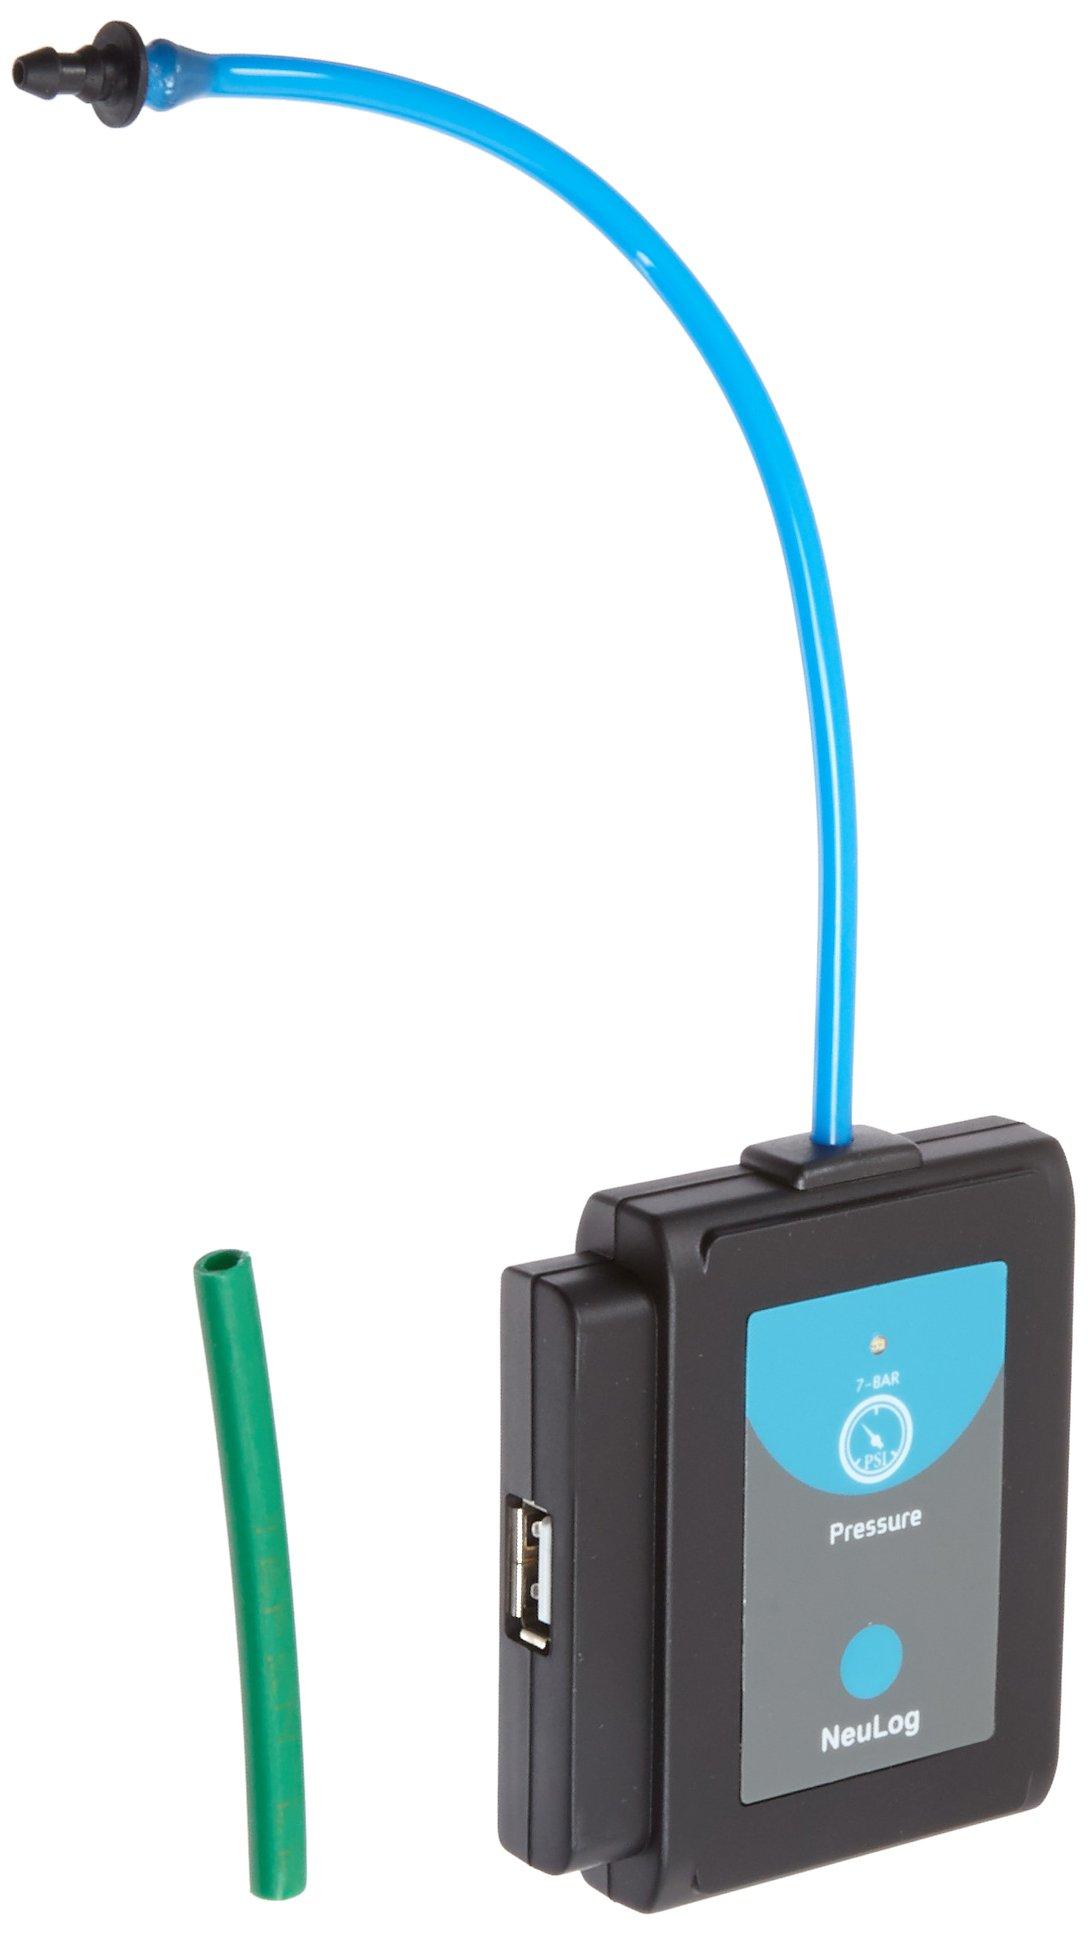 NEULOG Pressure Logger Sensor, 16 bit ADC Resolution, 100 S/sec Maximum Sample Rate